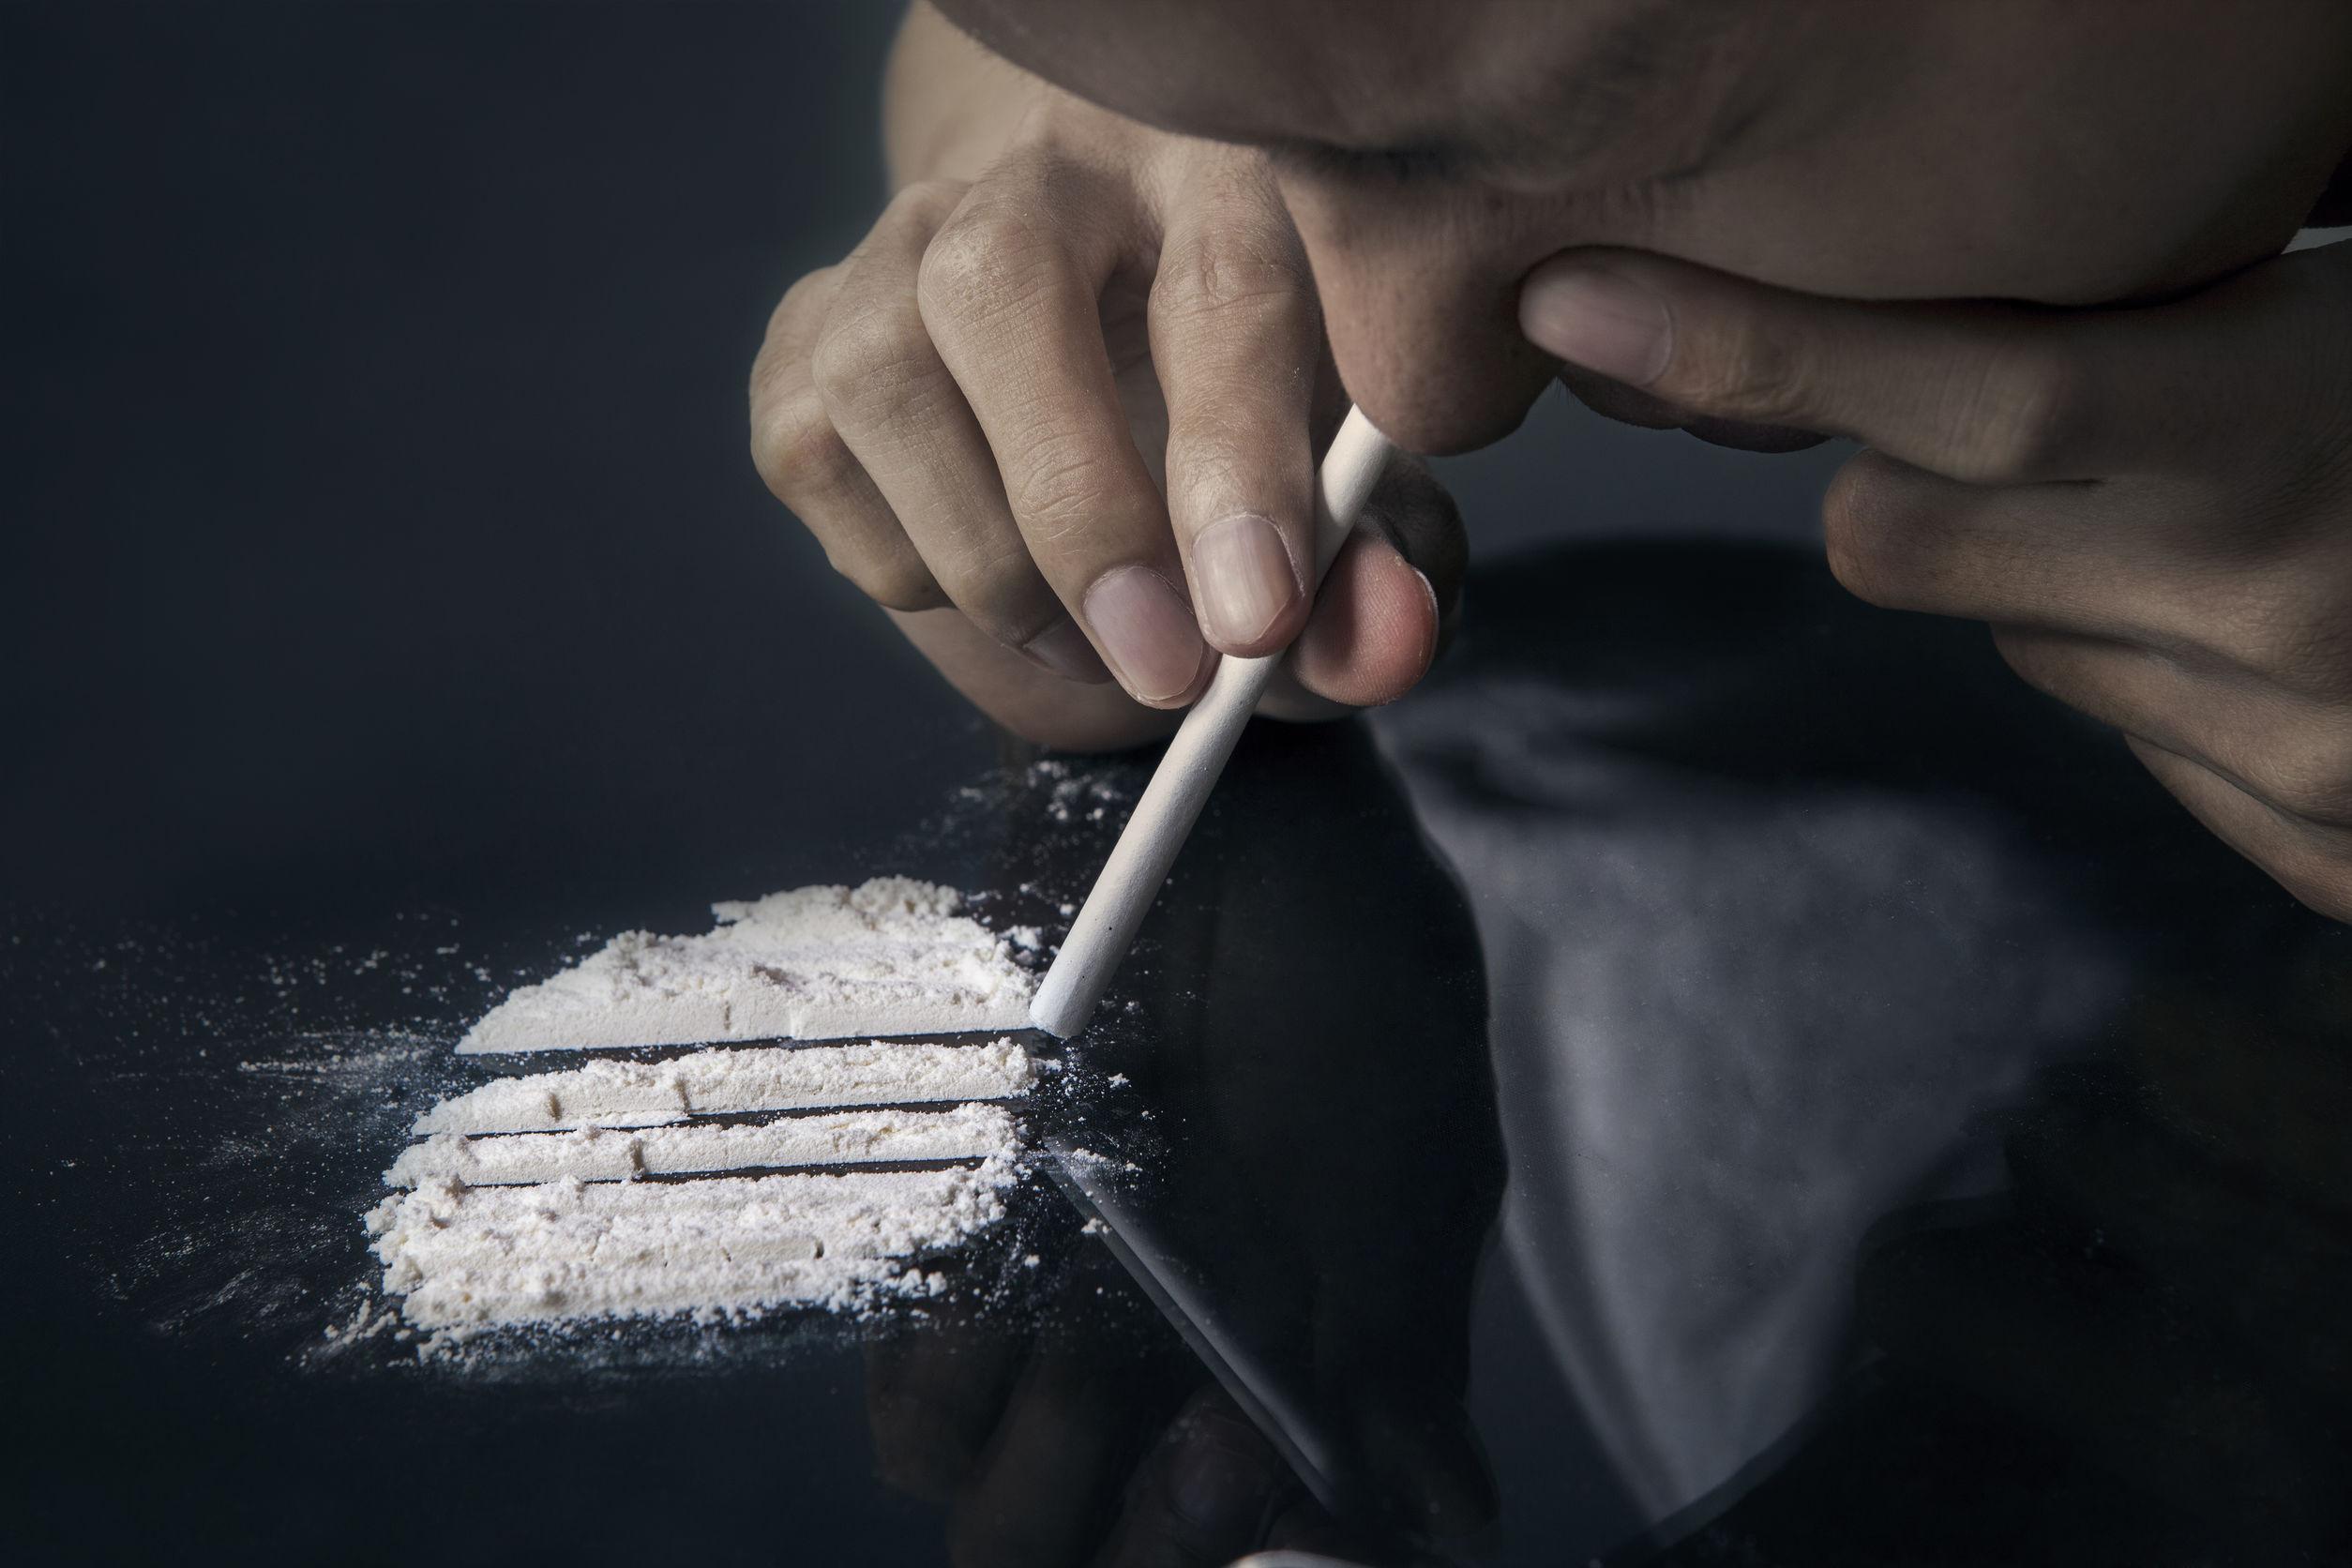 A man inhale cocaine